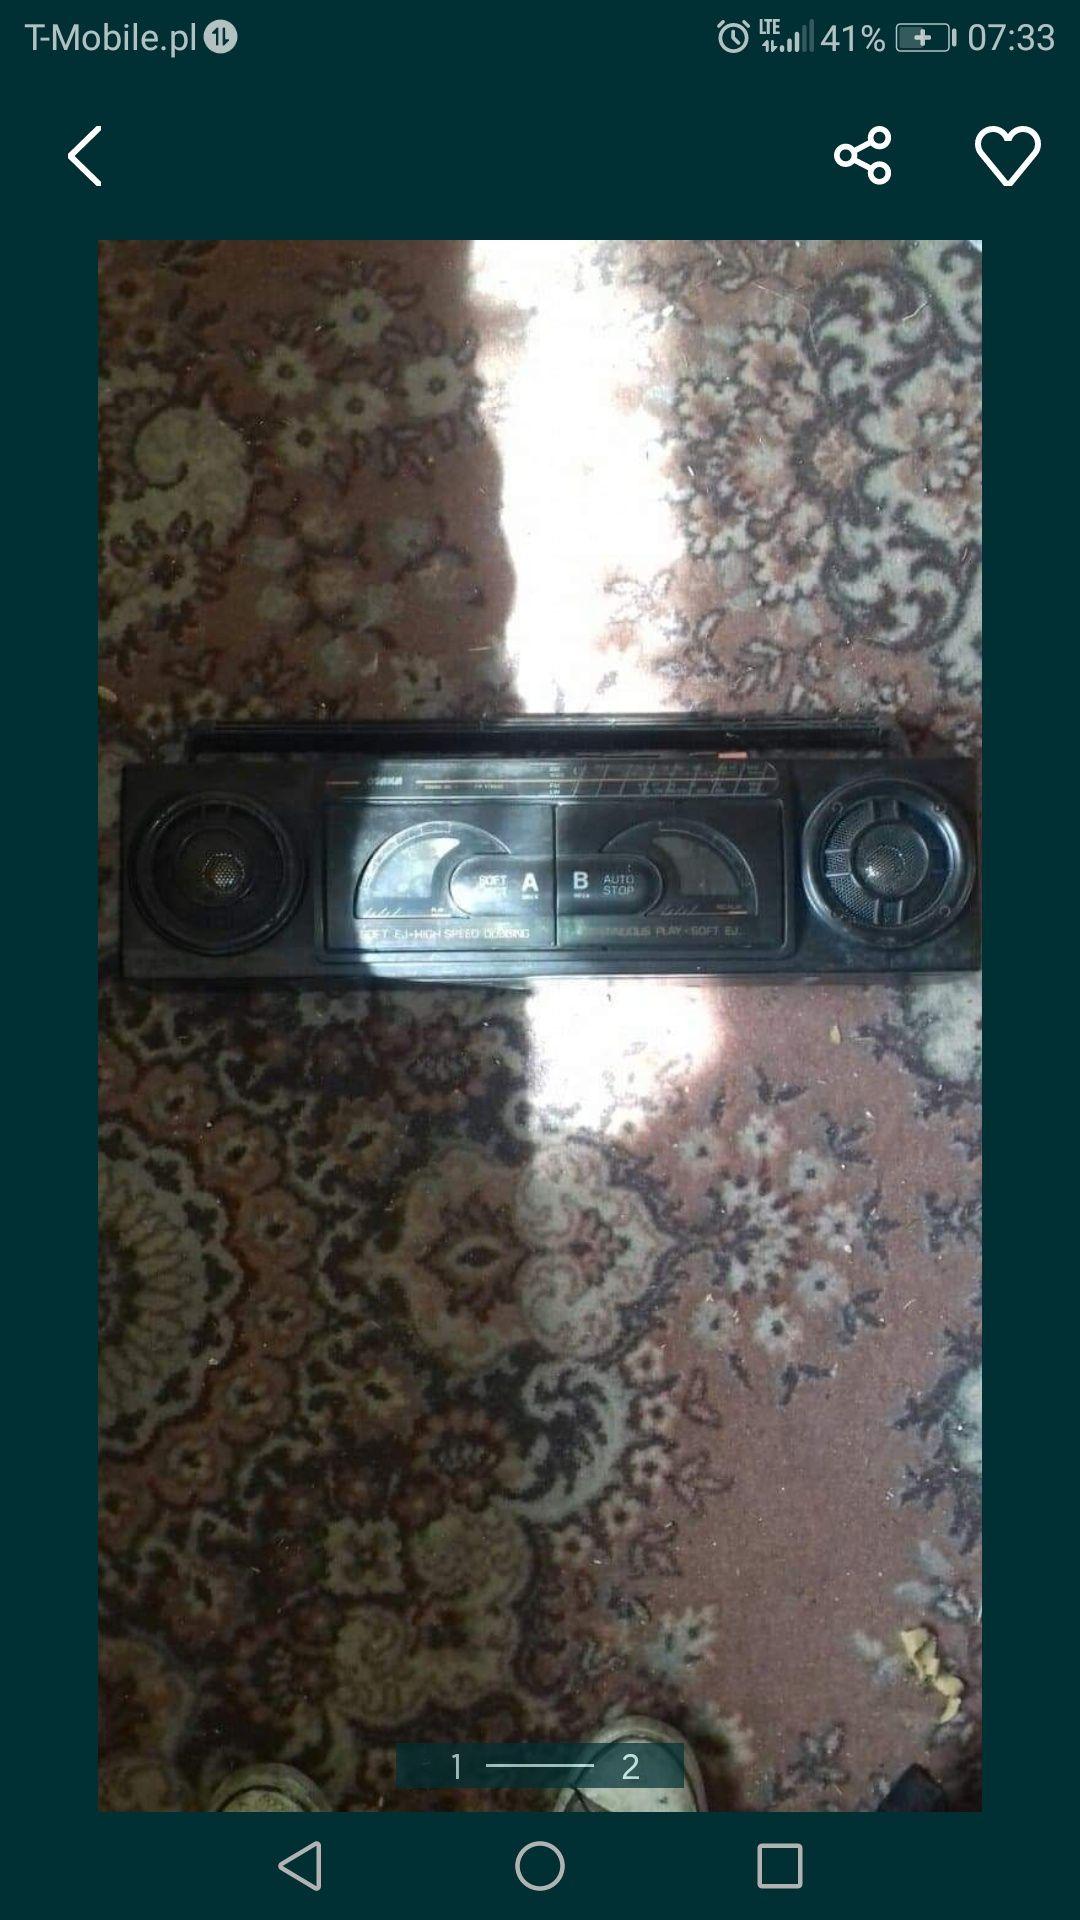 Radia na kasety wysyłam